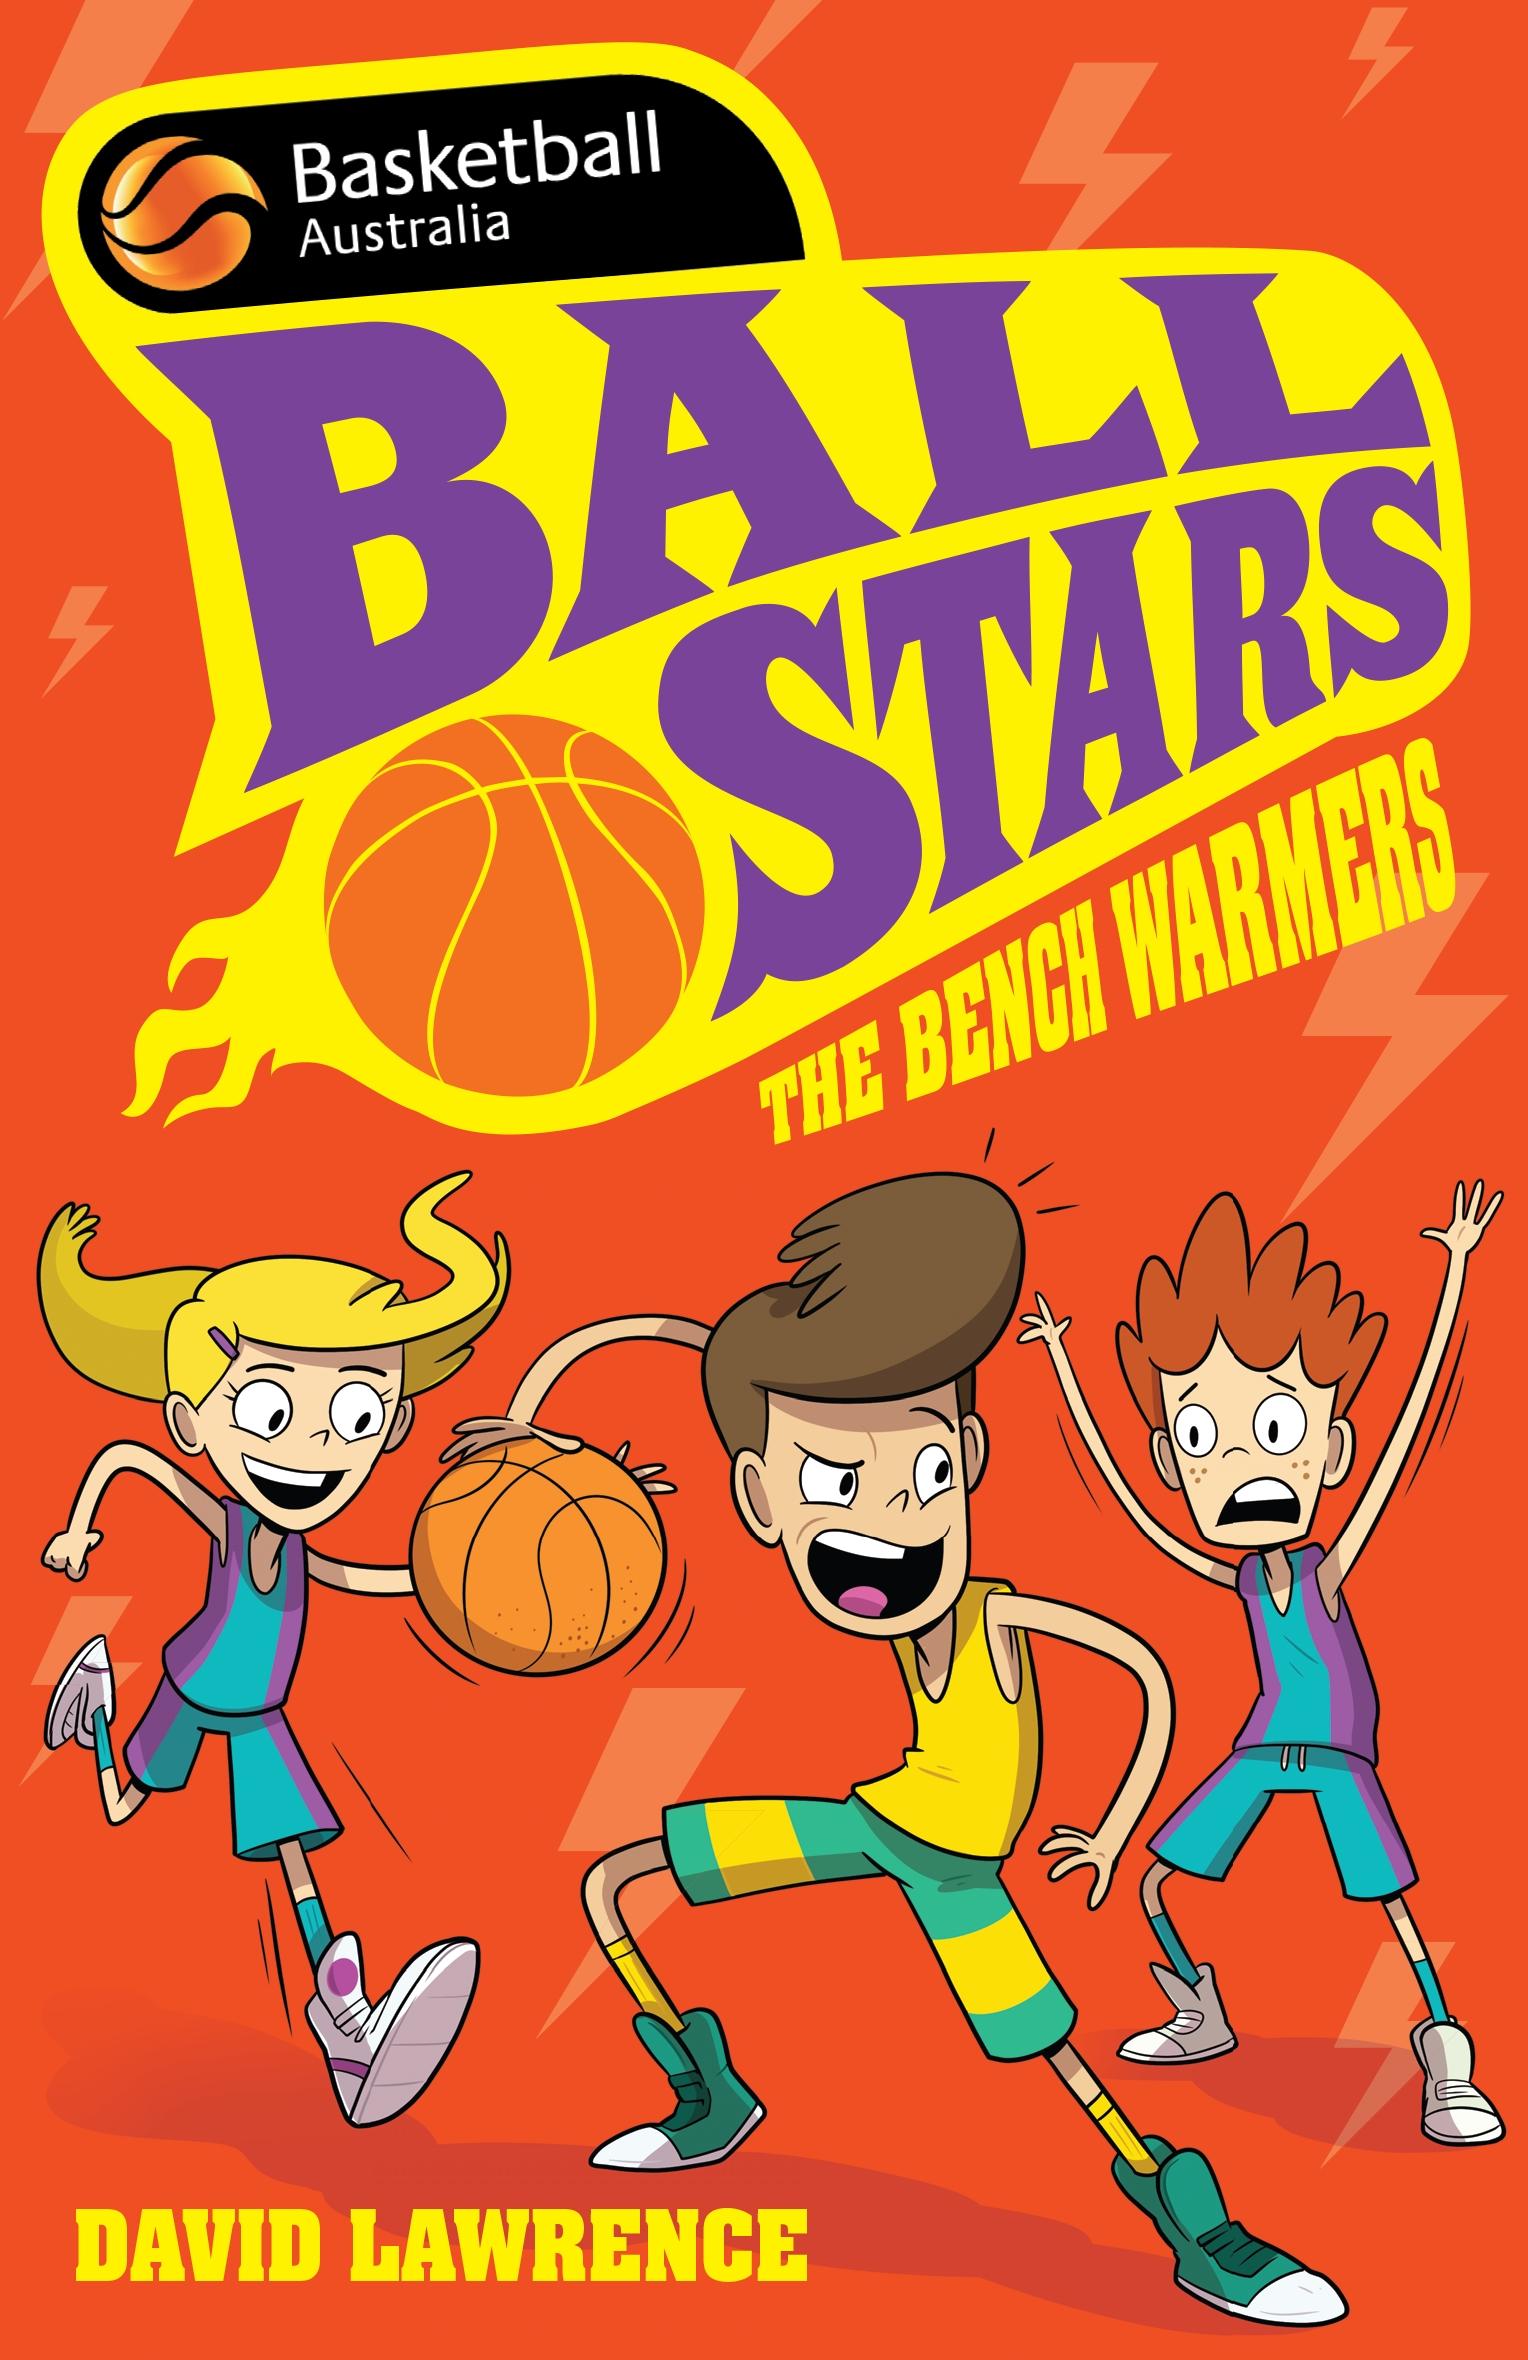 Ball Stars Bench Warmers cover.jpg